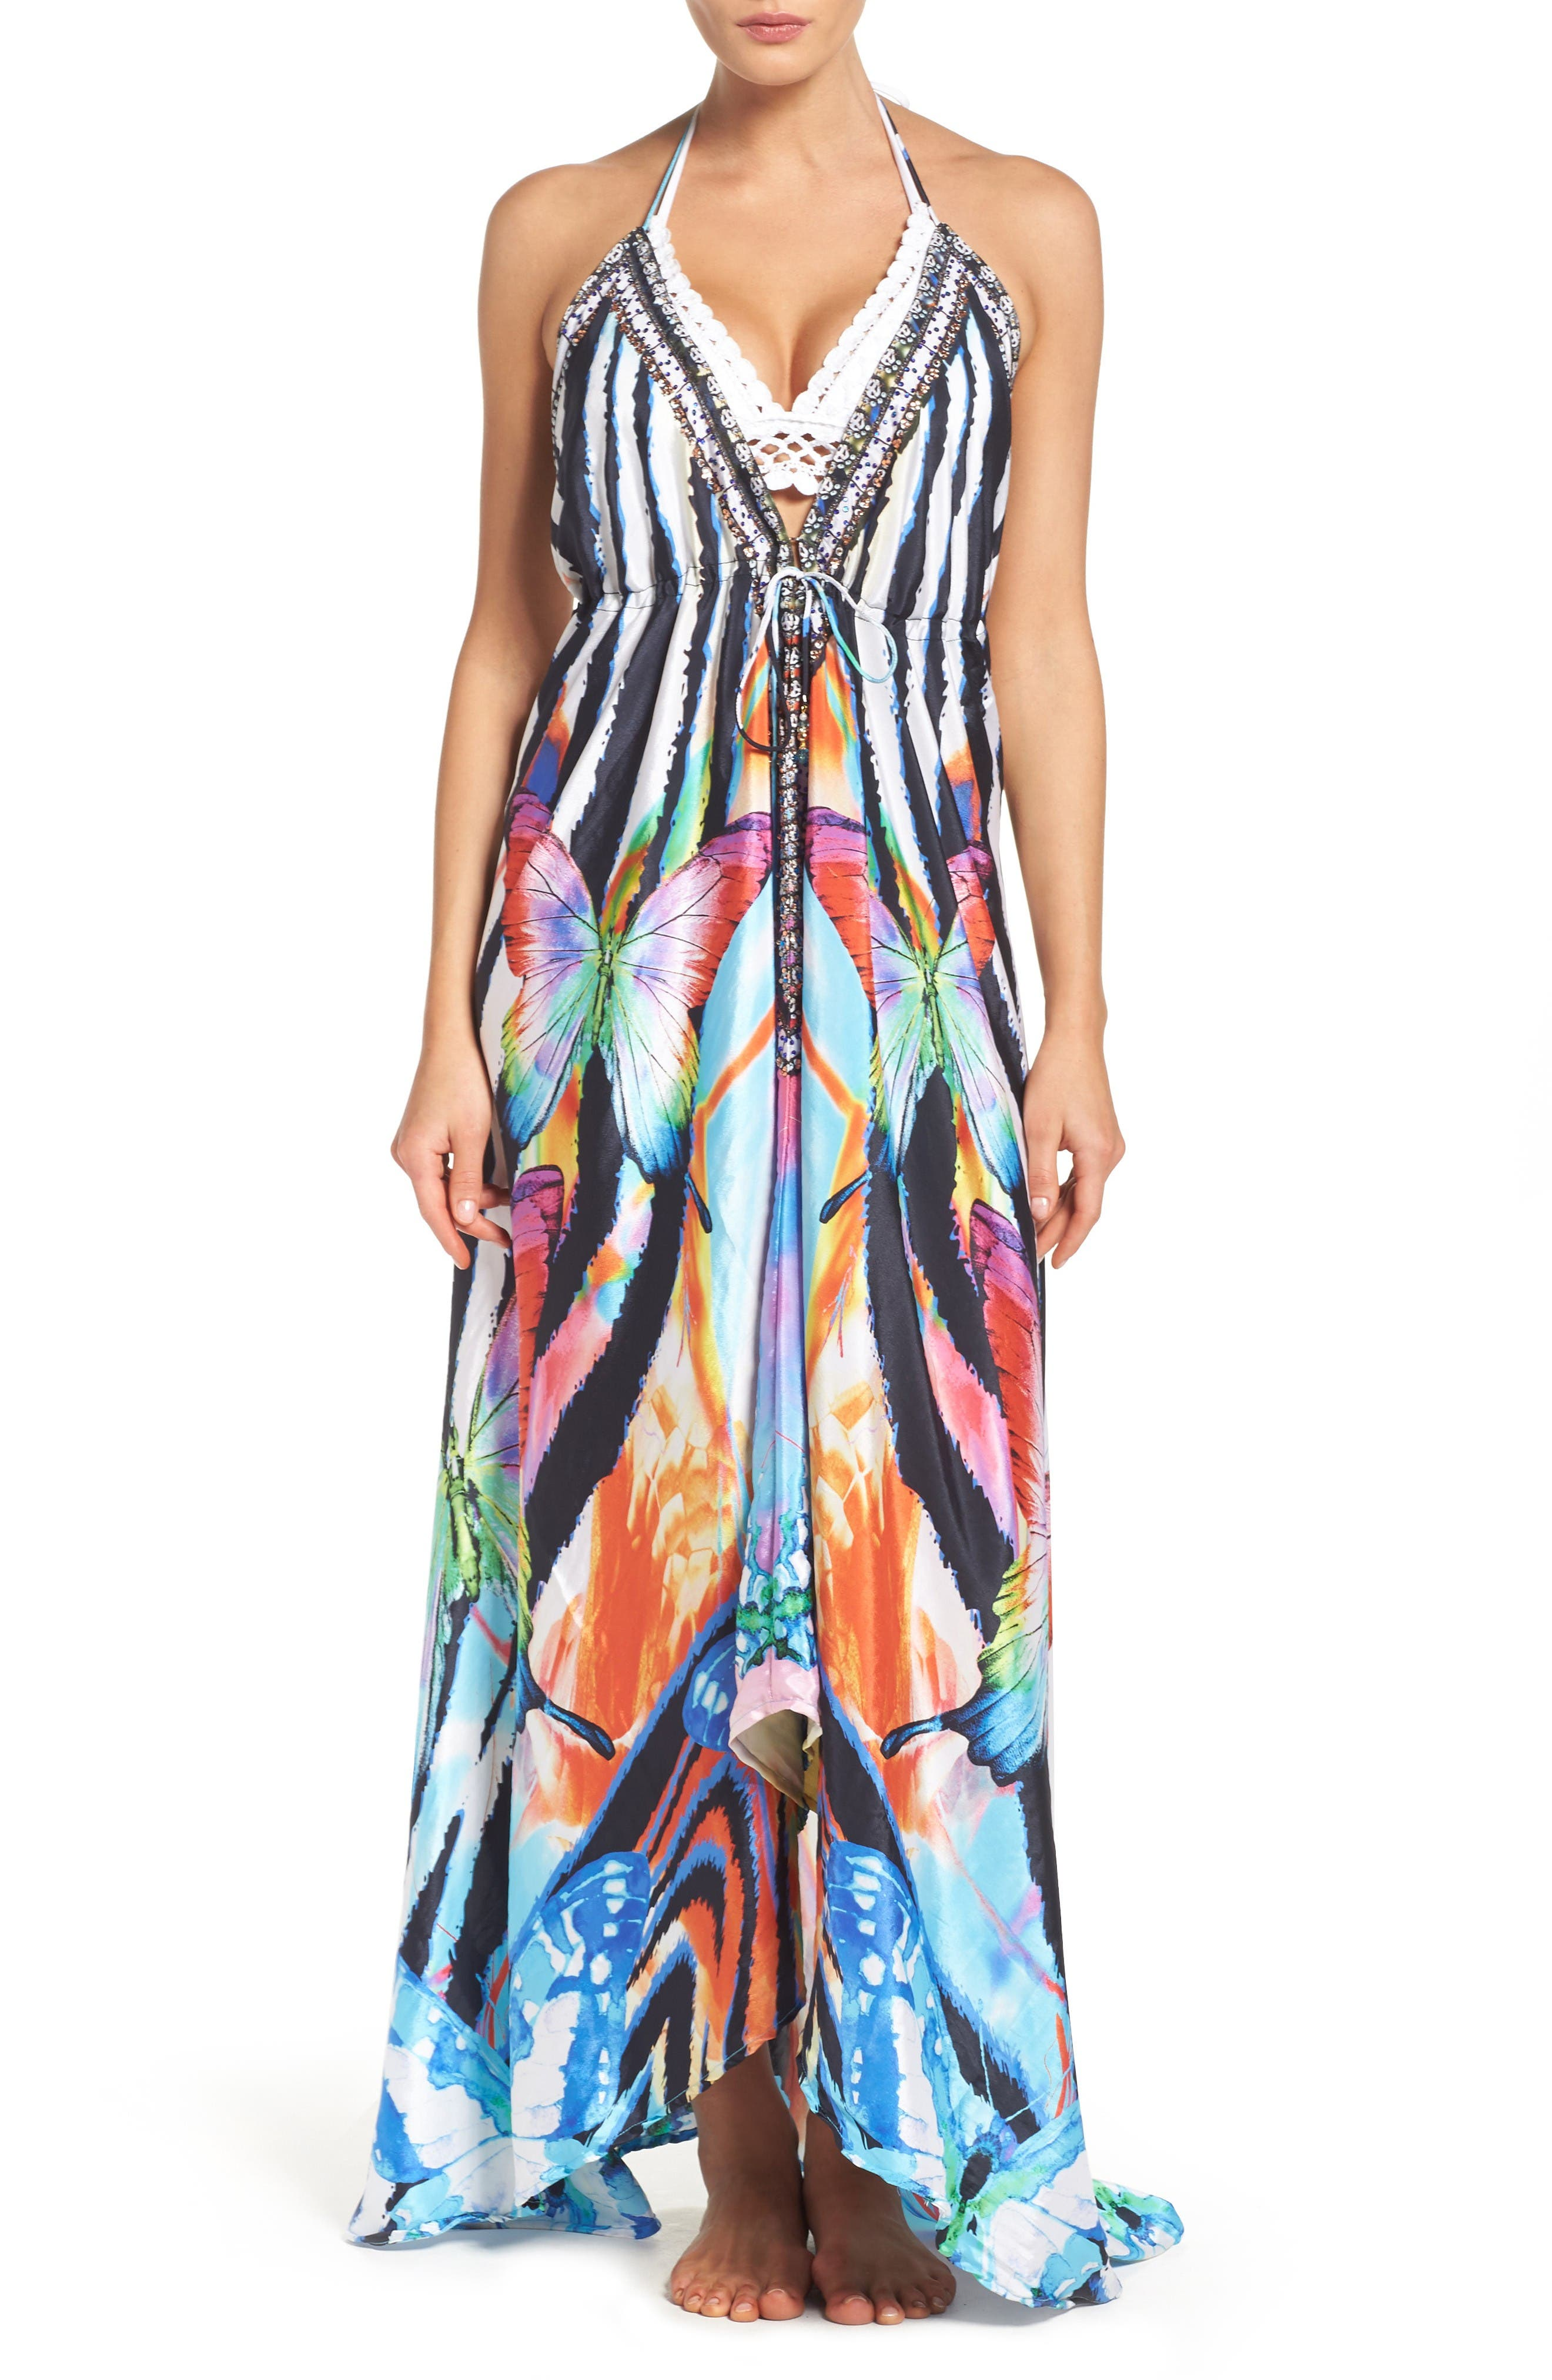 Alternate Image 1 Selected - Asa Kaftans Tortuga Cover-Up Maxi Dress